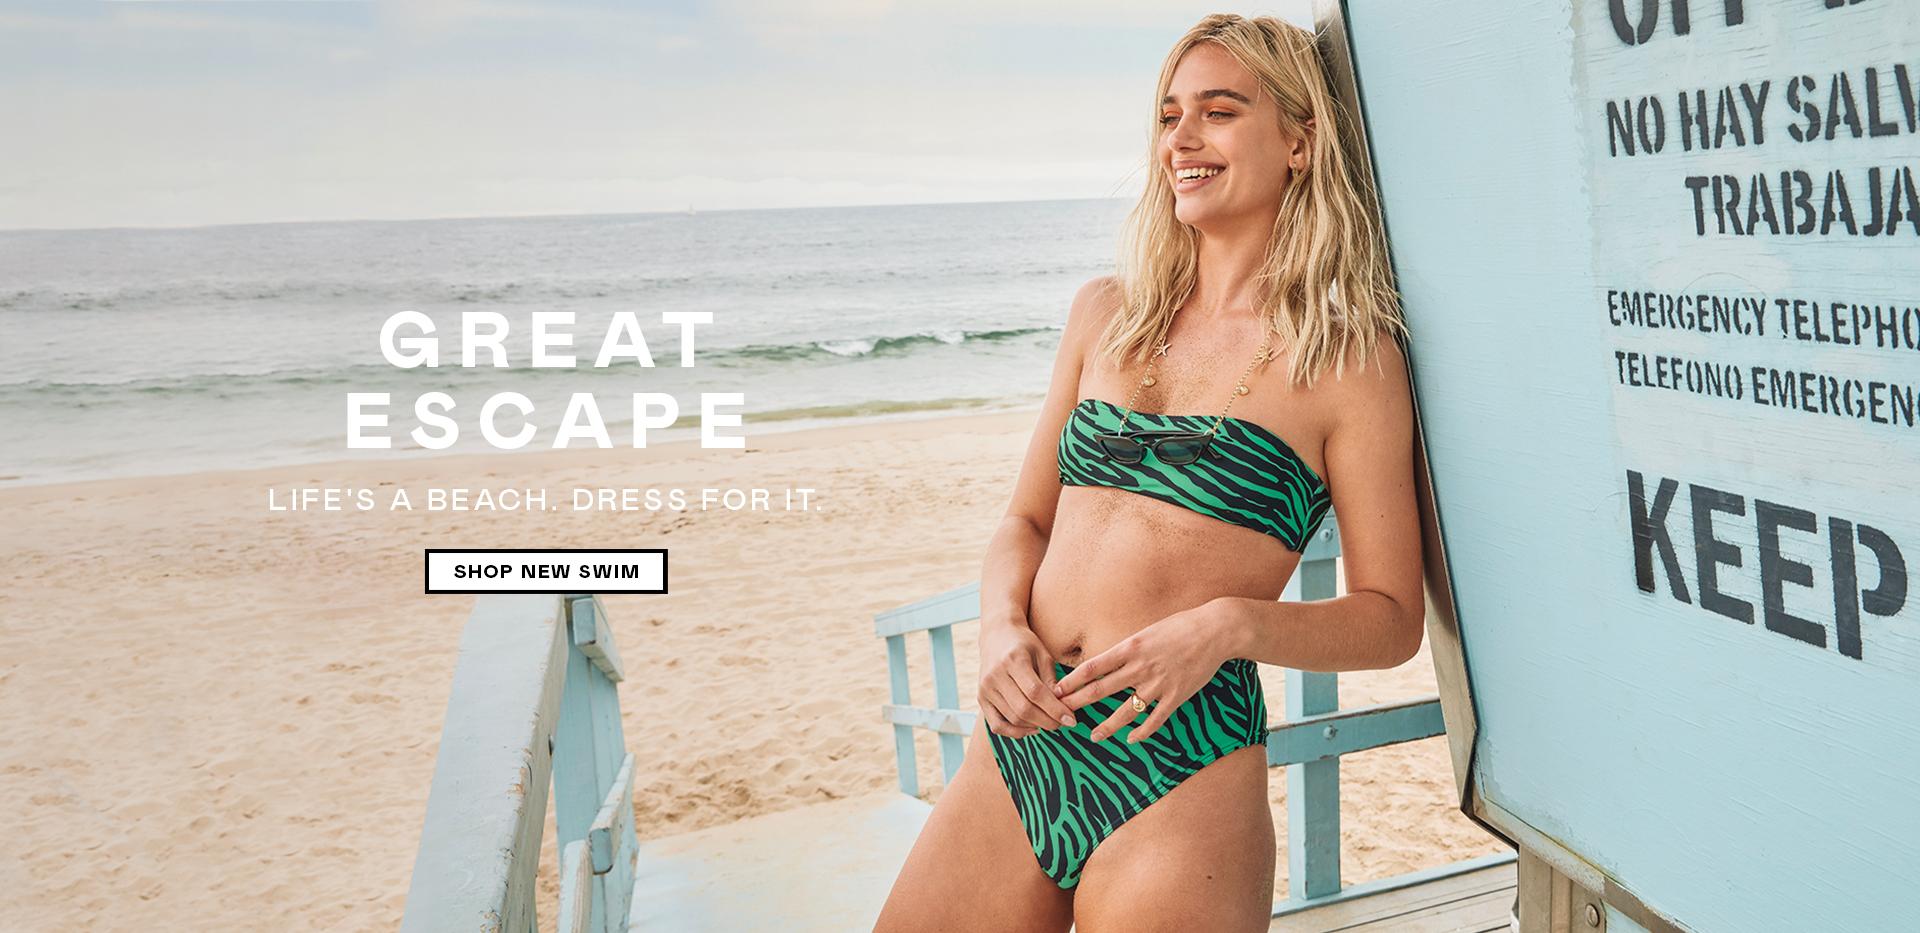 290f33af04f5f Women's Online Clothes & Fashion Shopping | Nasty Gal